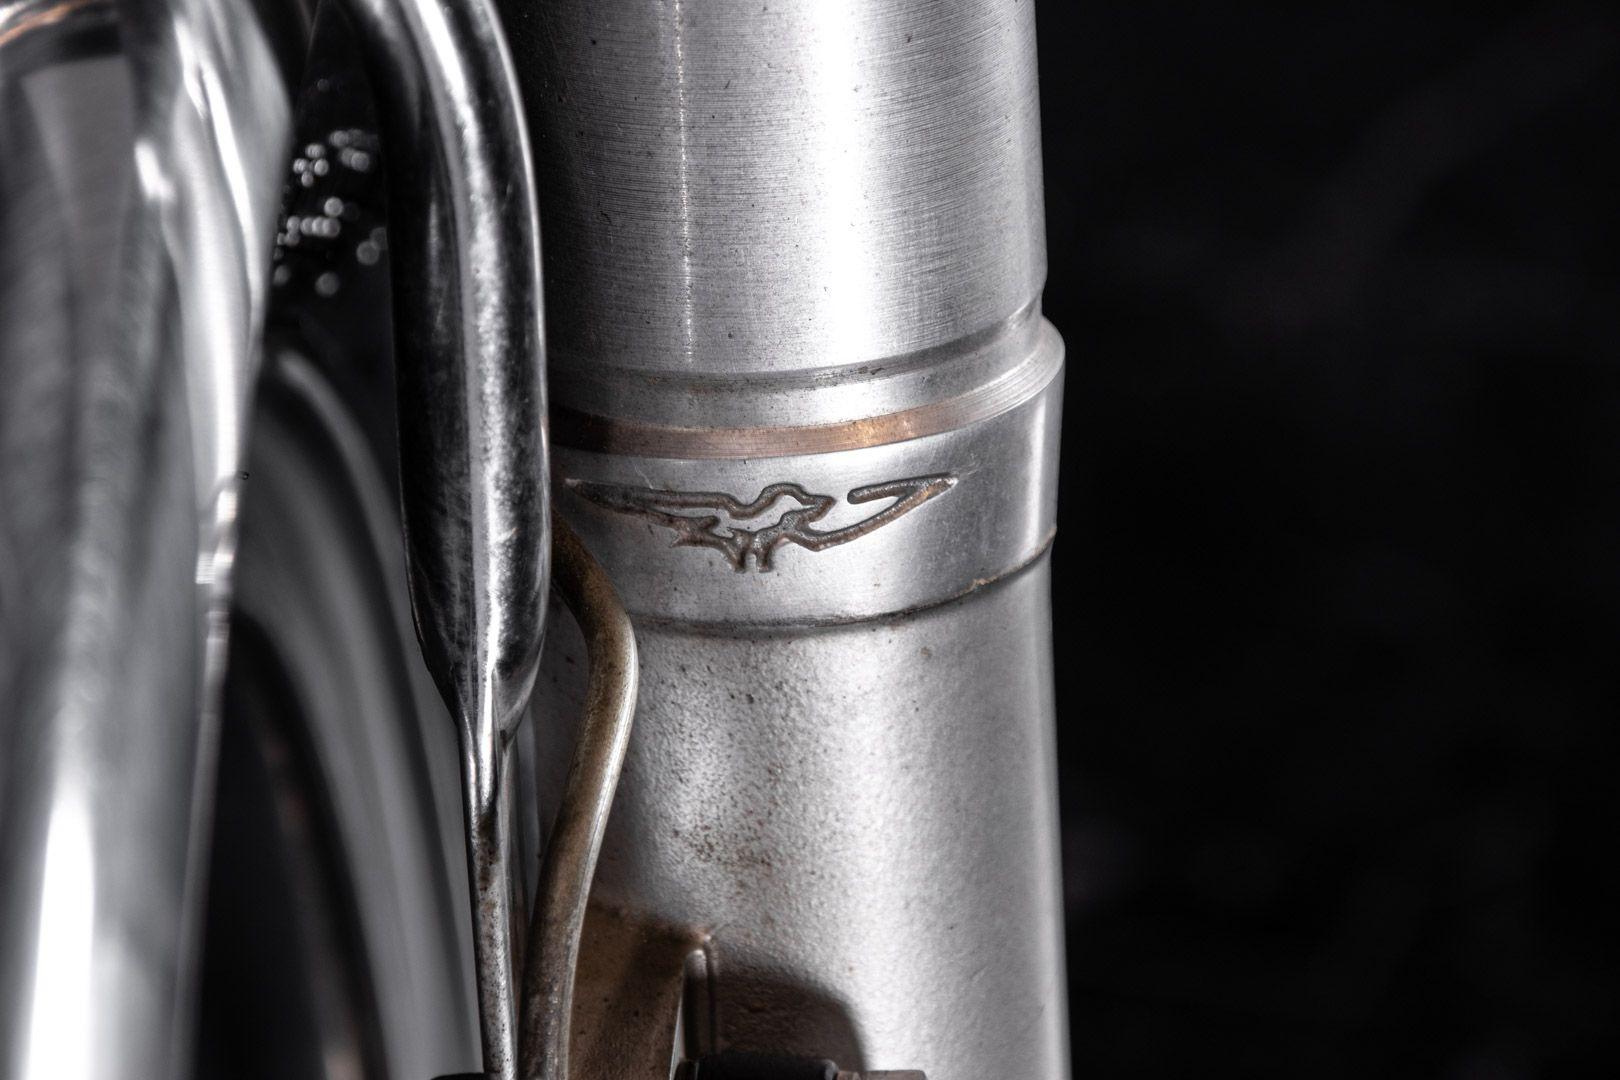 1981 Moto Guzzi 850 T3 California 83269